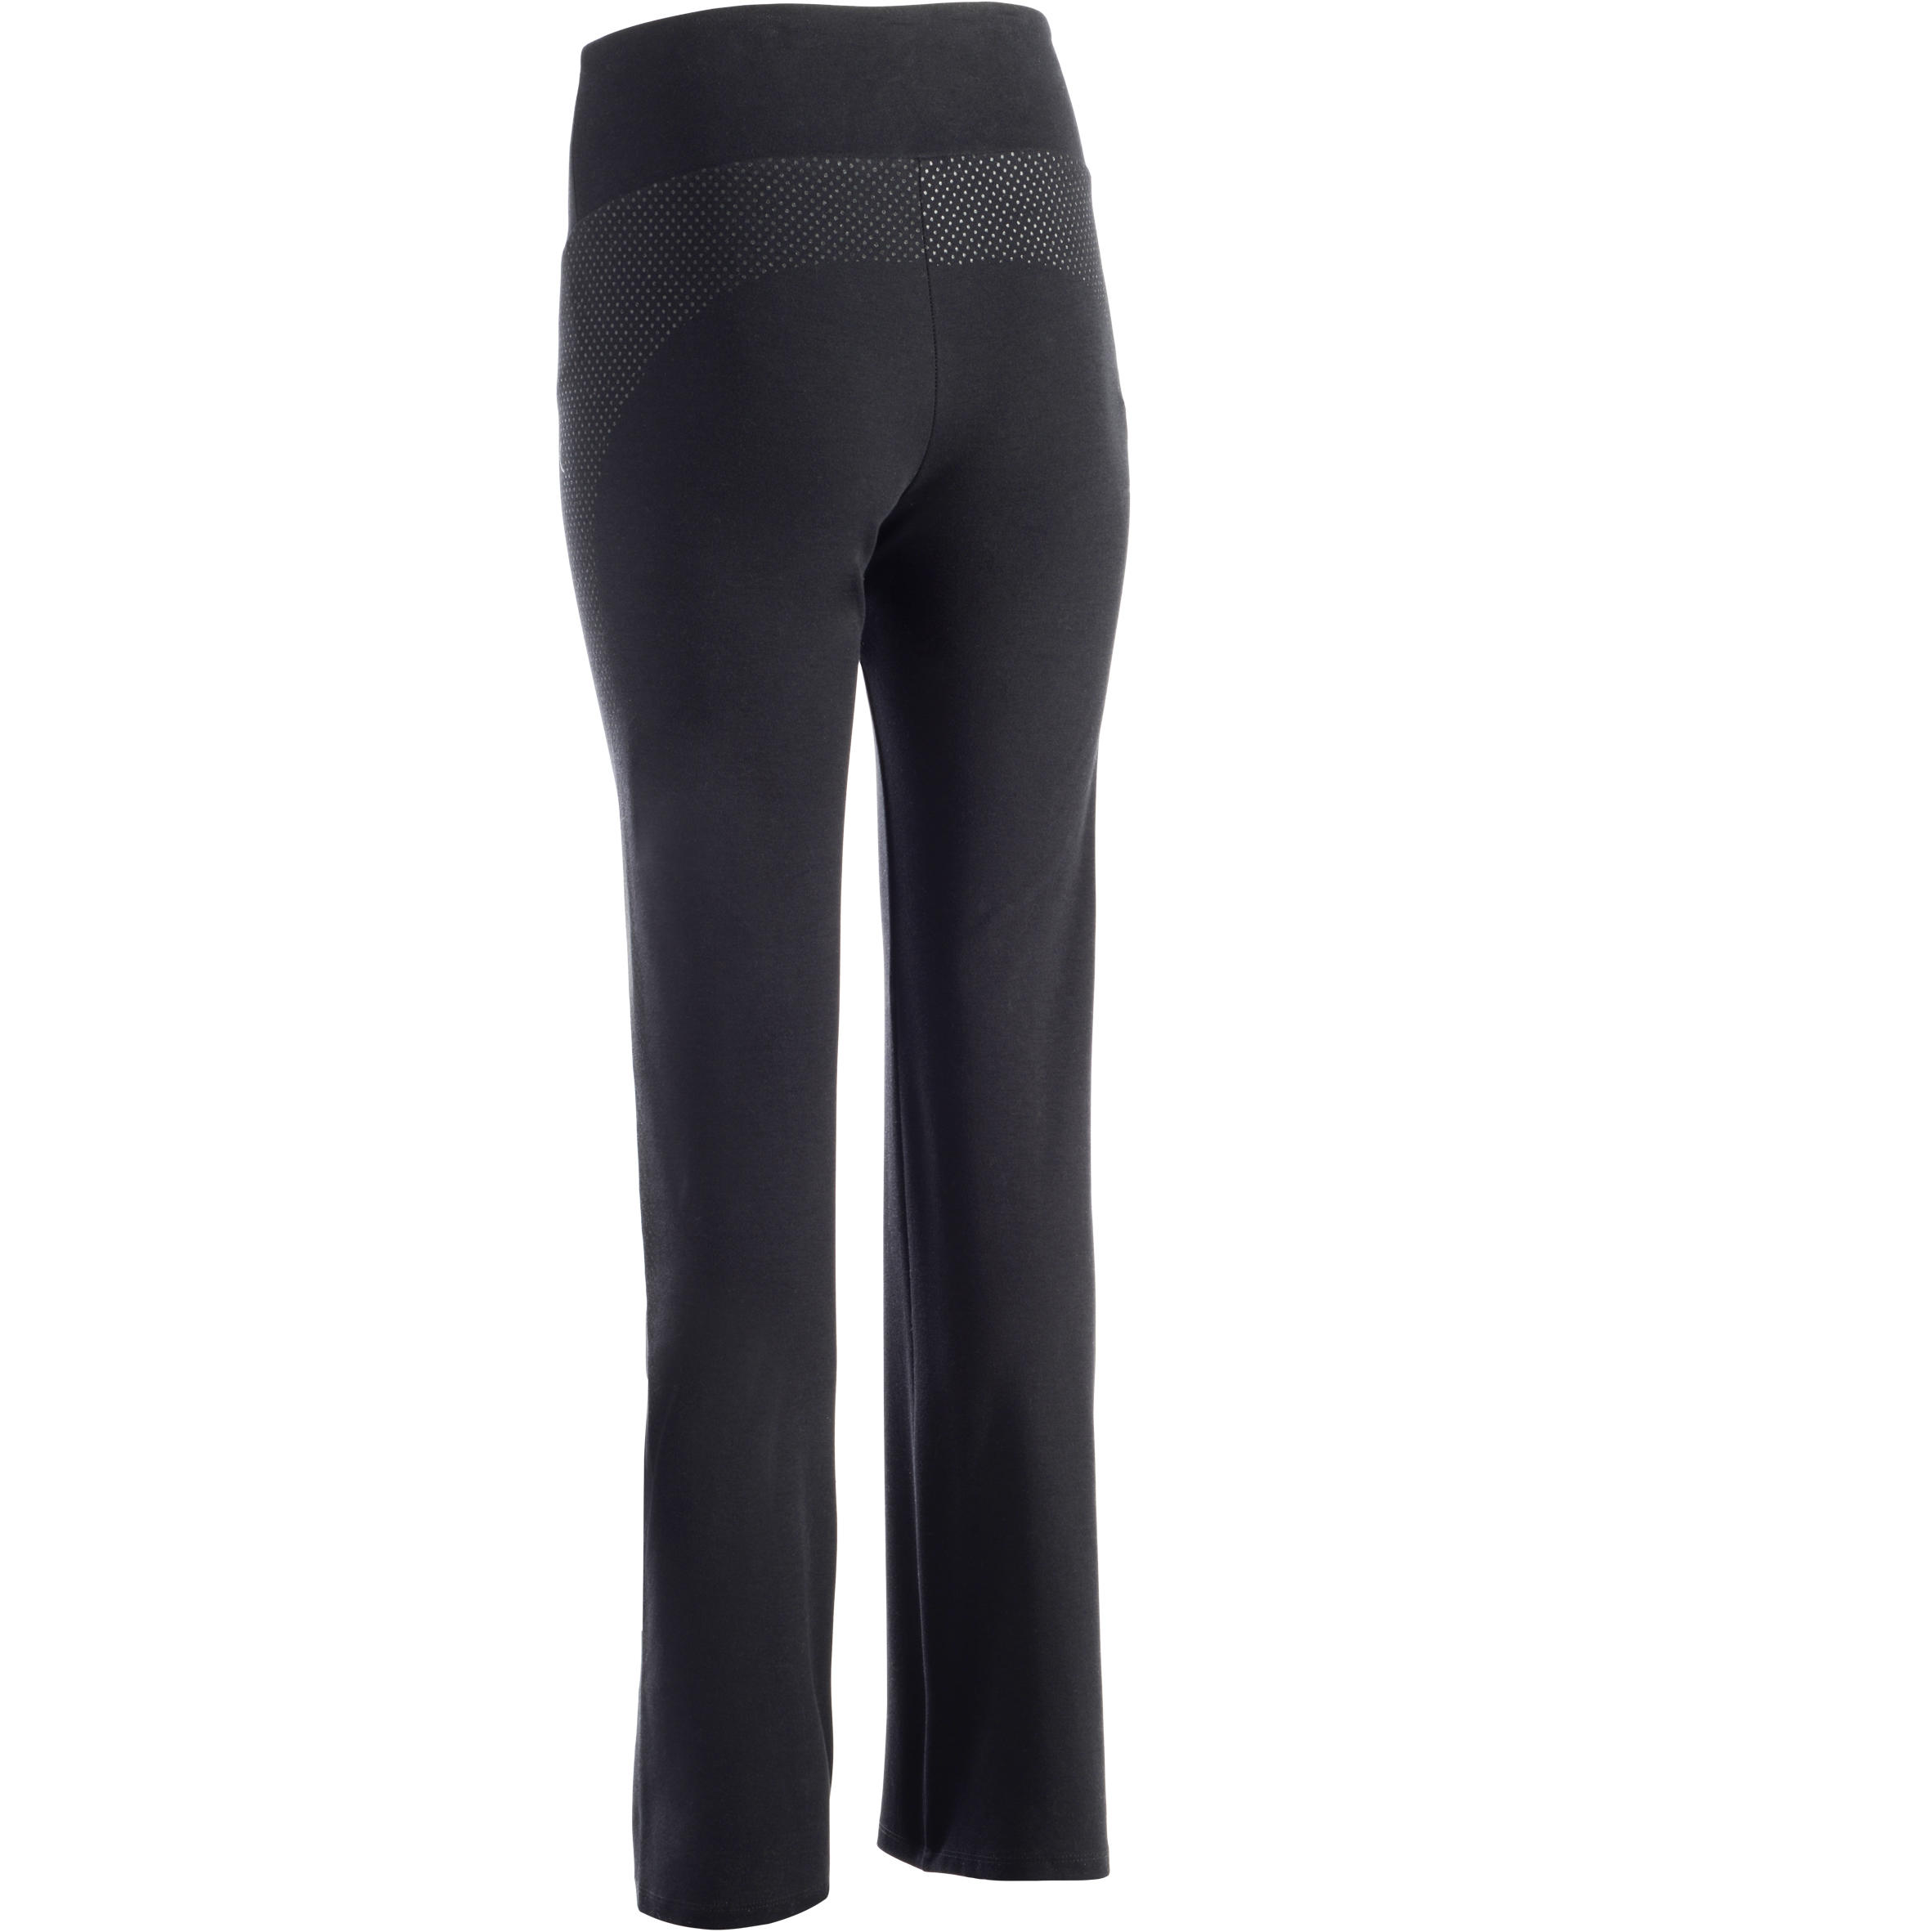 900 Women's Regular-Fit Stretching & Pilates Leggings - Black